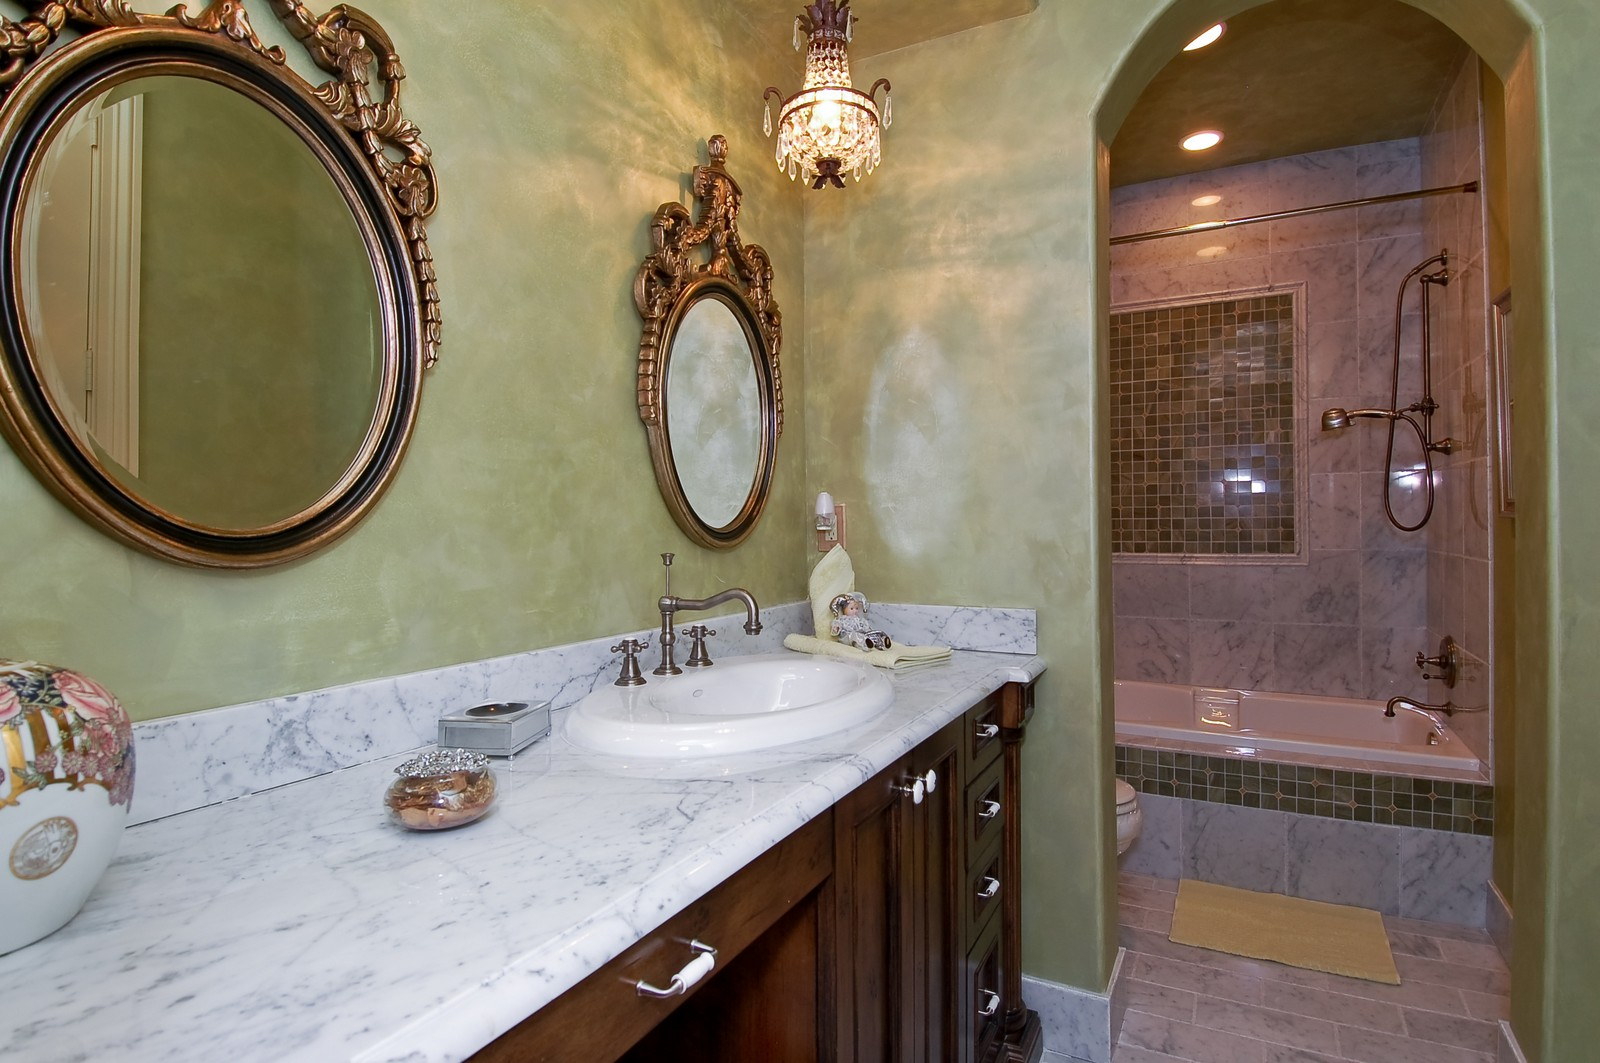 Real Estate Photography - 215 Royal Palm Way, Boca Raton, FL, 33432 - Bathroom